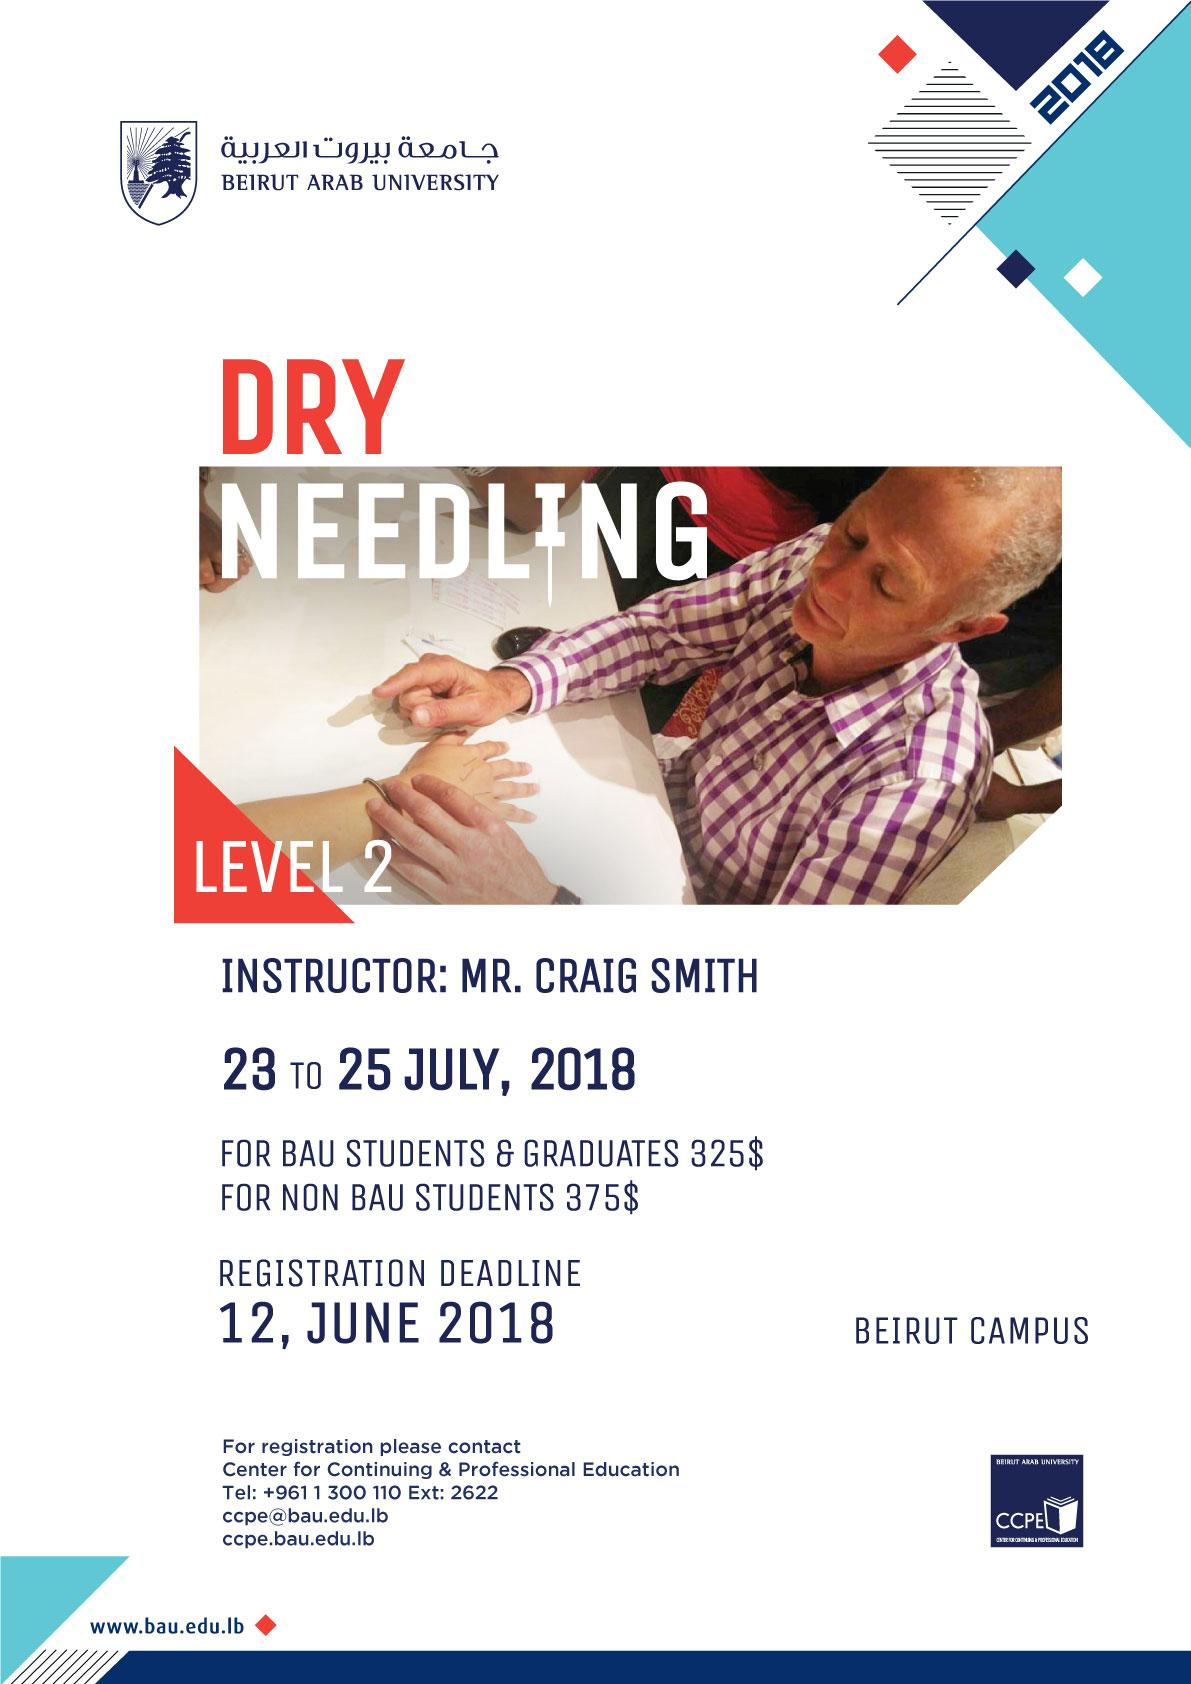 Dry Needling: Level 2